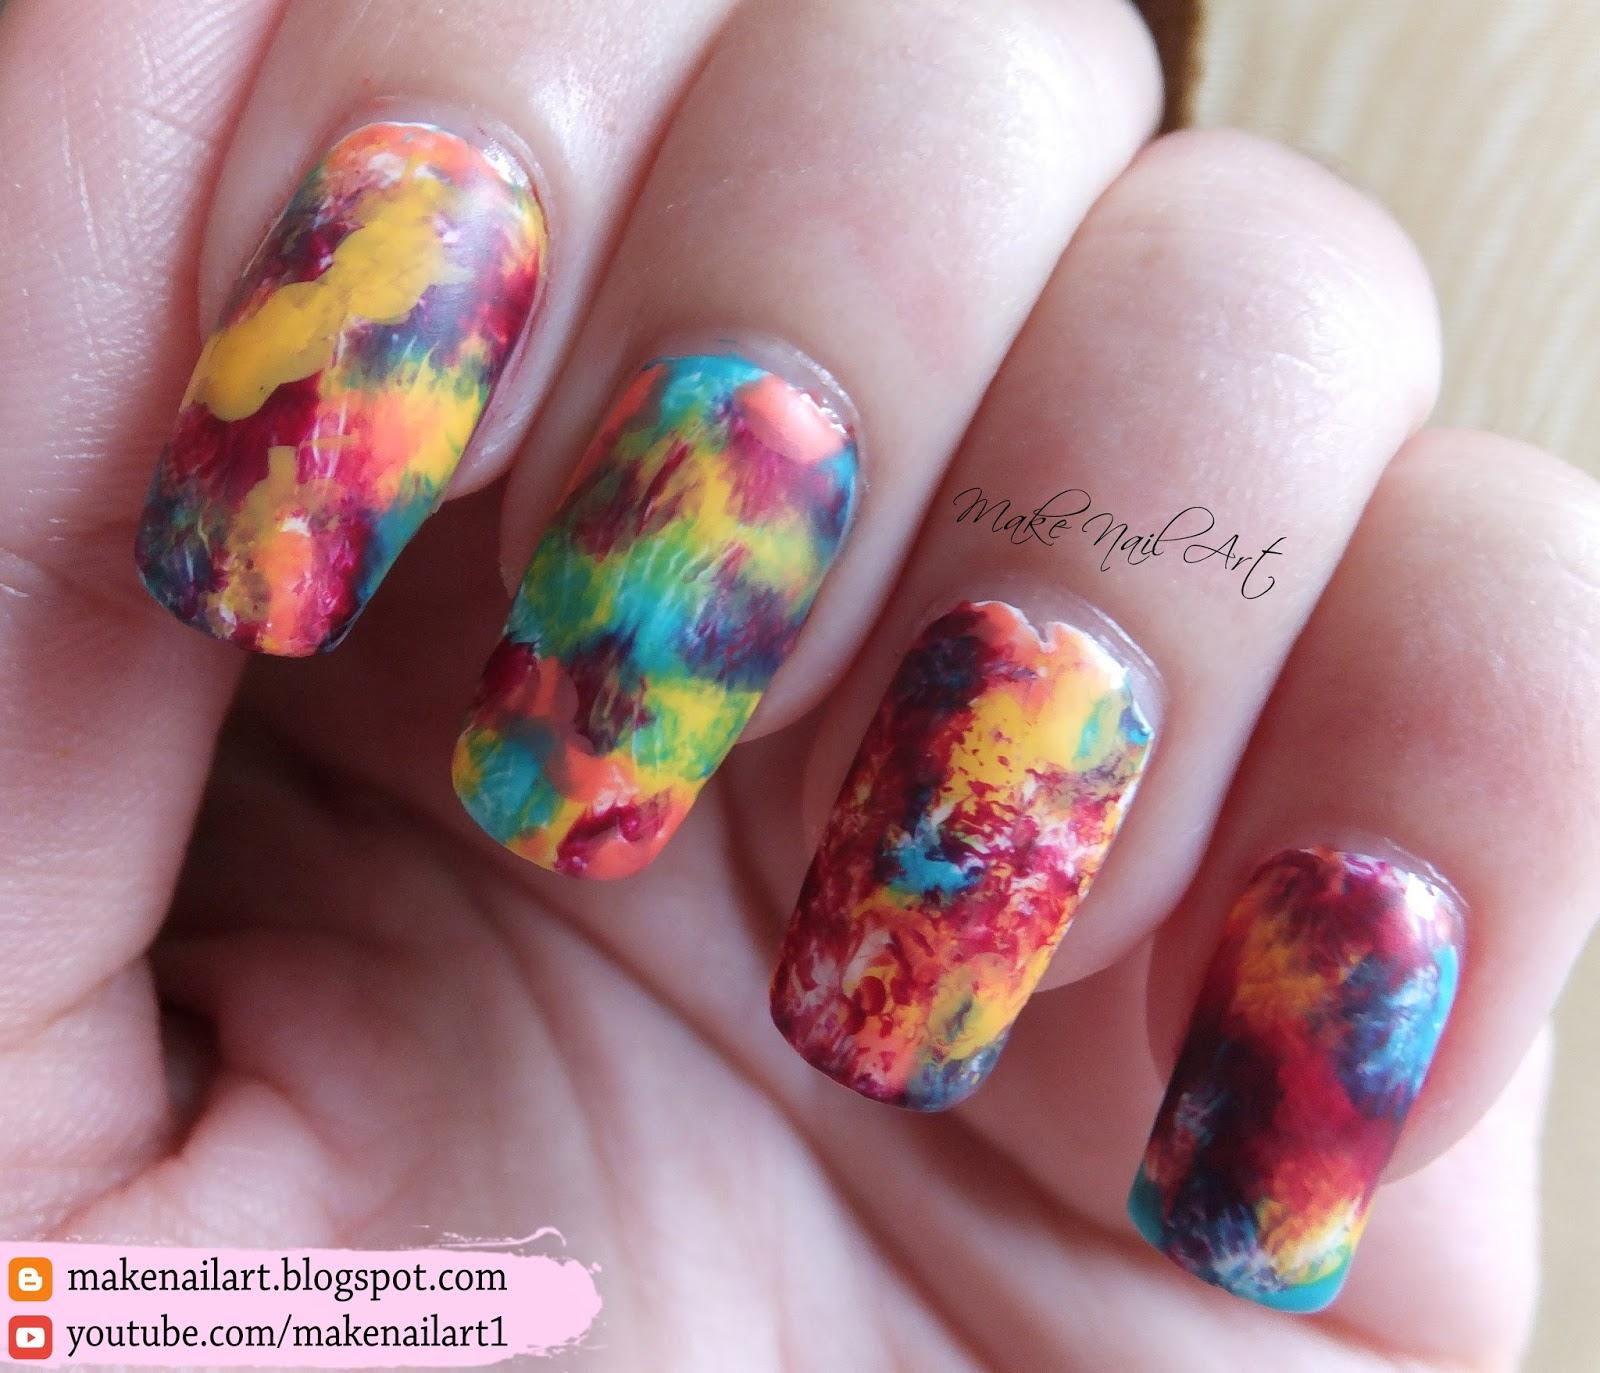 Make Nail Art: Easy Autumn Nail Art Design Tutorial